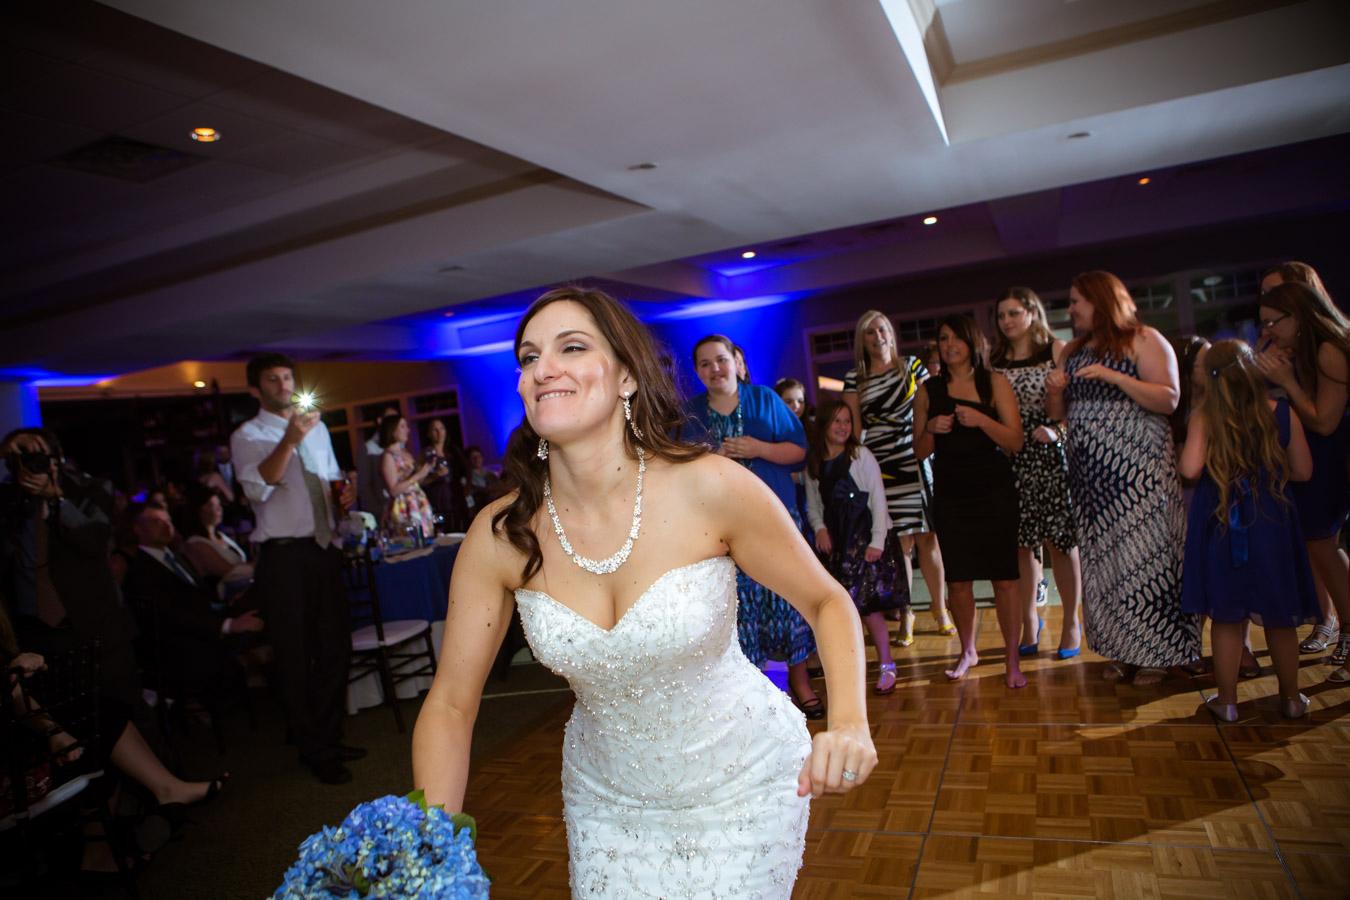 NEPA_Pocono_Weddings_Rob_Lettieri_Photography_17.jpg